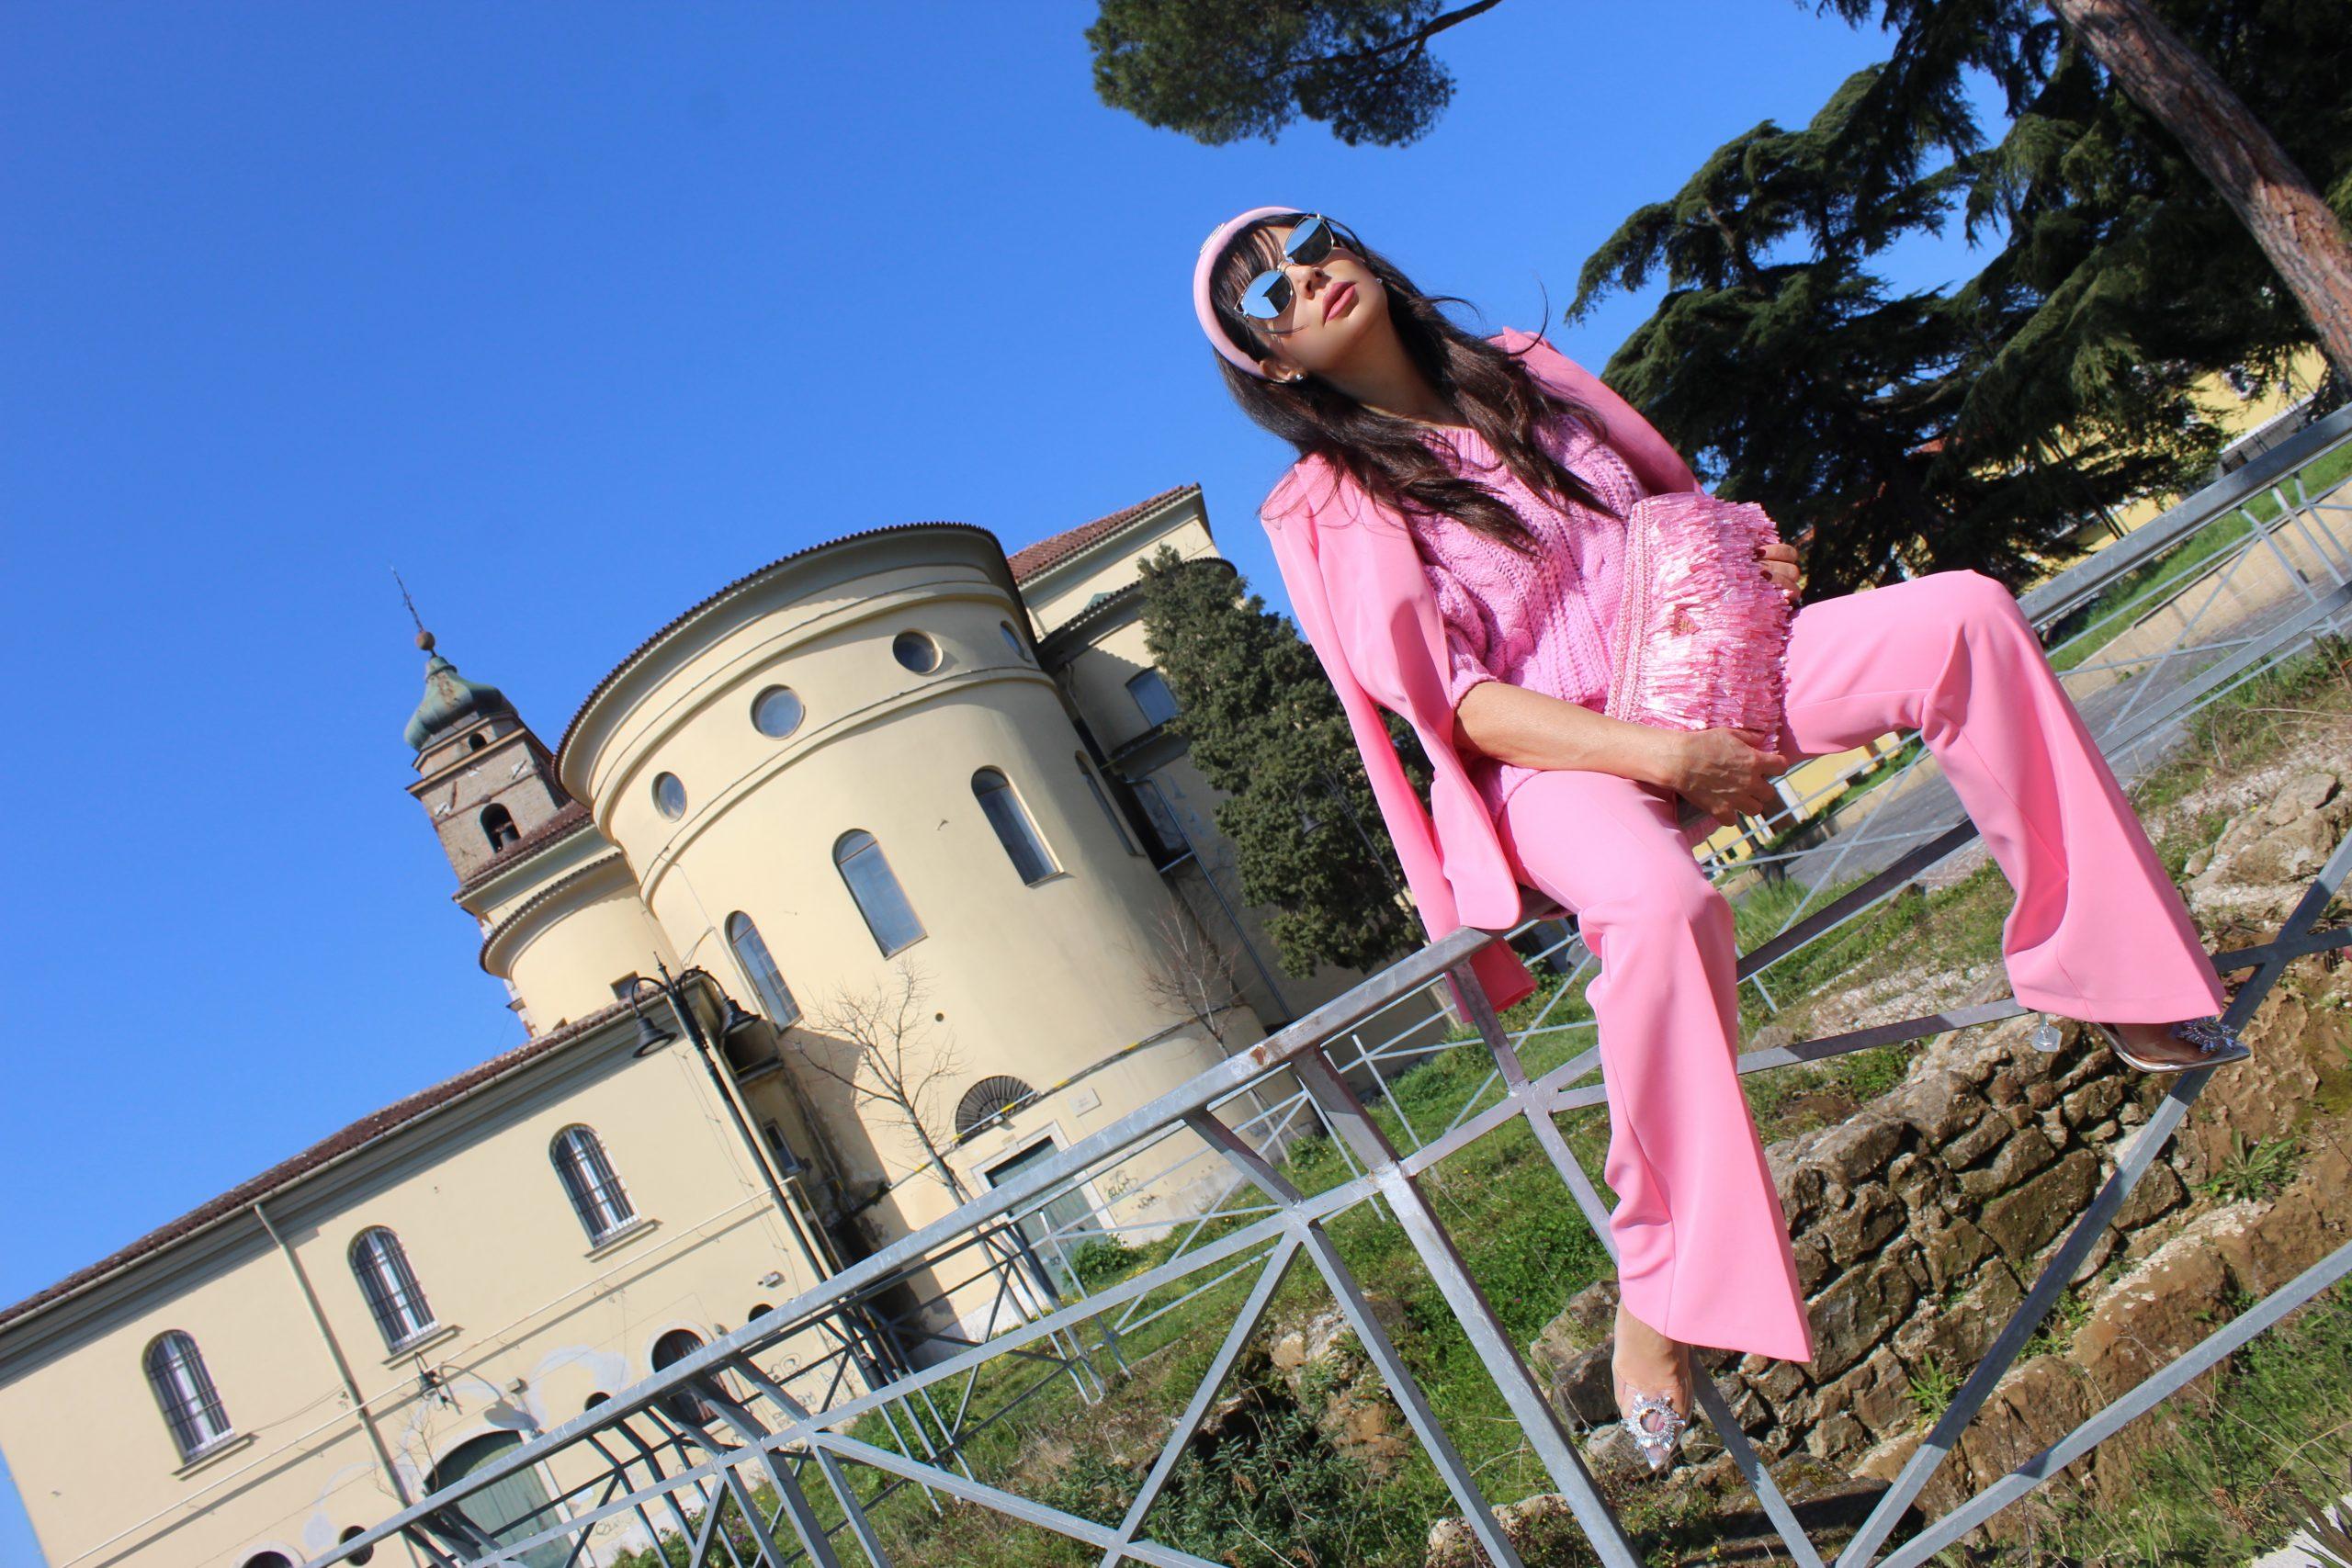 pink power spring trend hot pink prada accessories Paola Lauretano